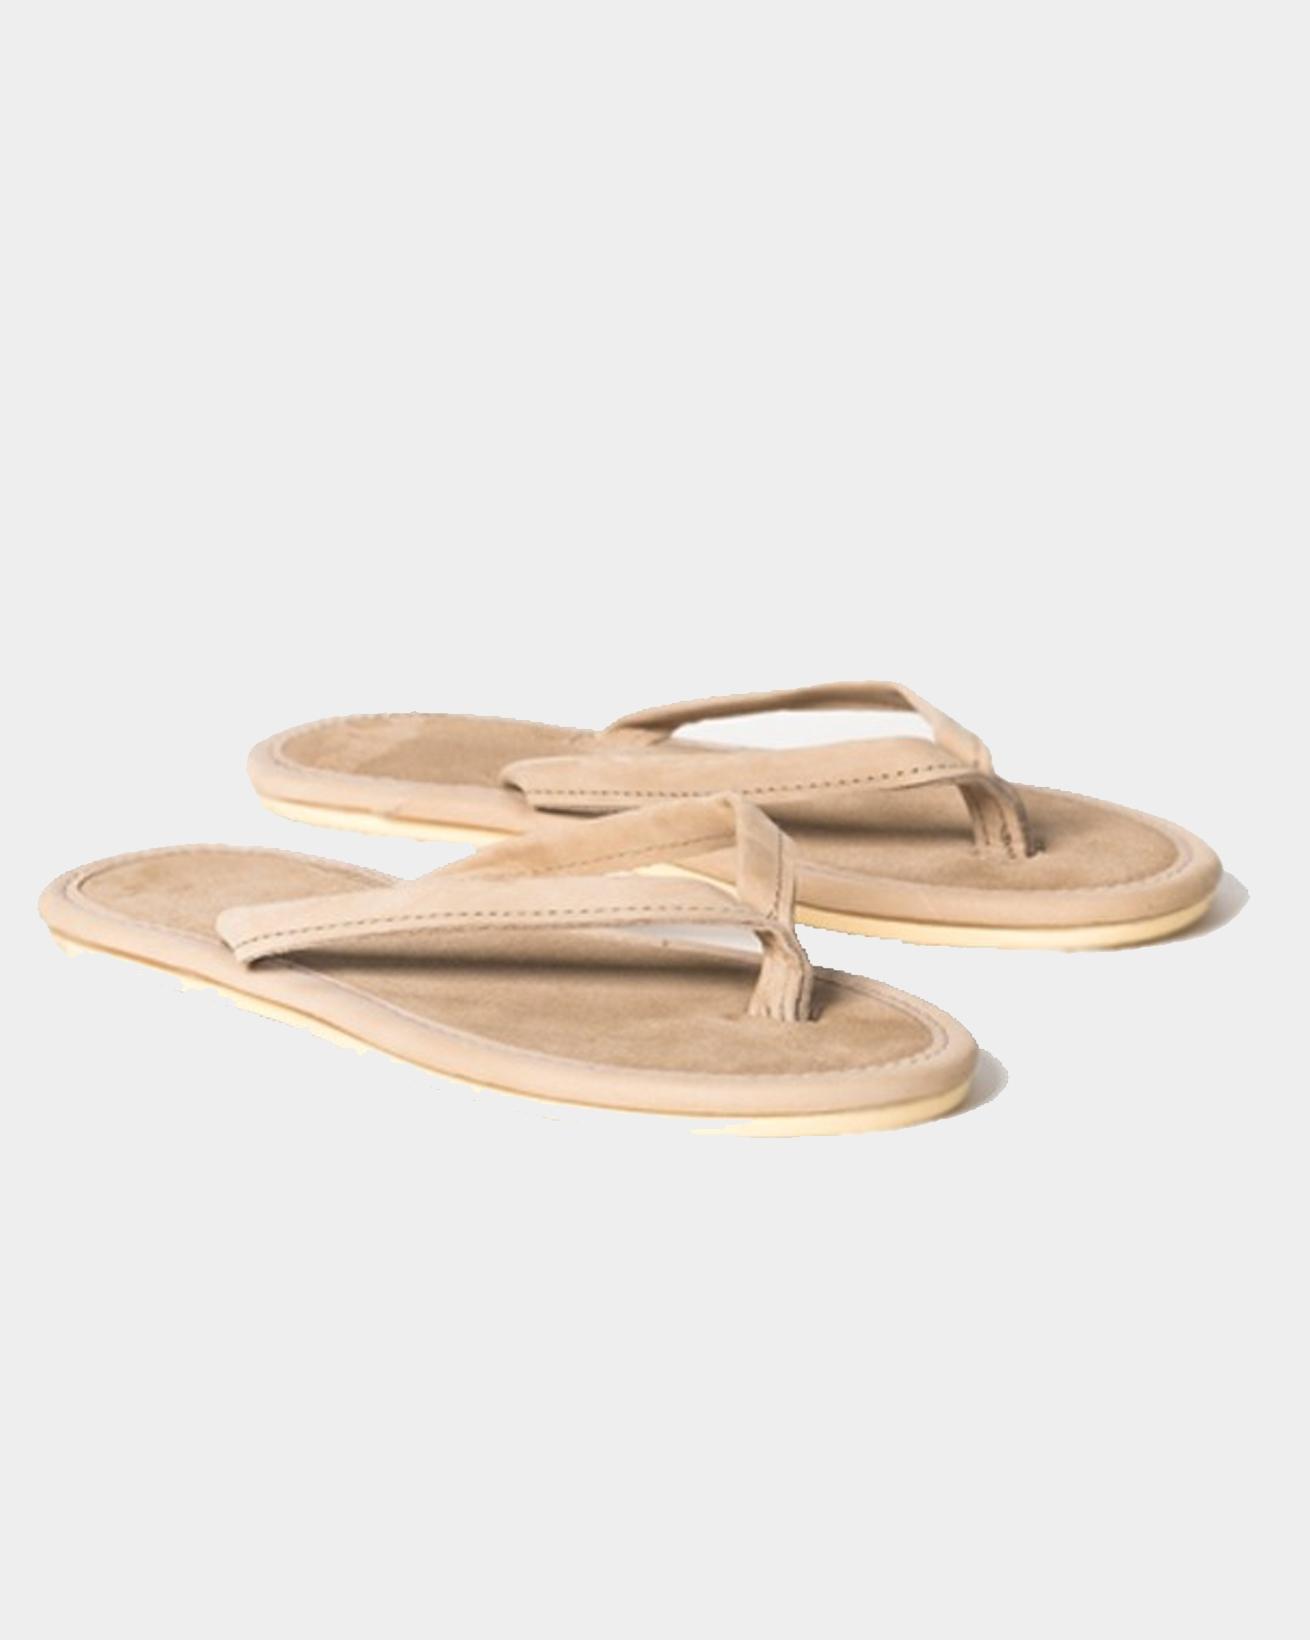 Nubuck & Suede Flip-flops - Size 8 - Taupe - 1539